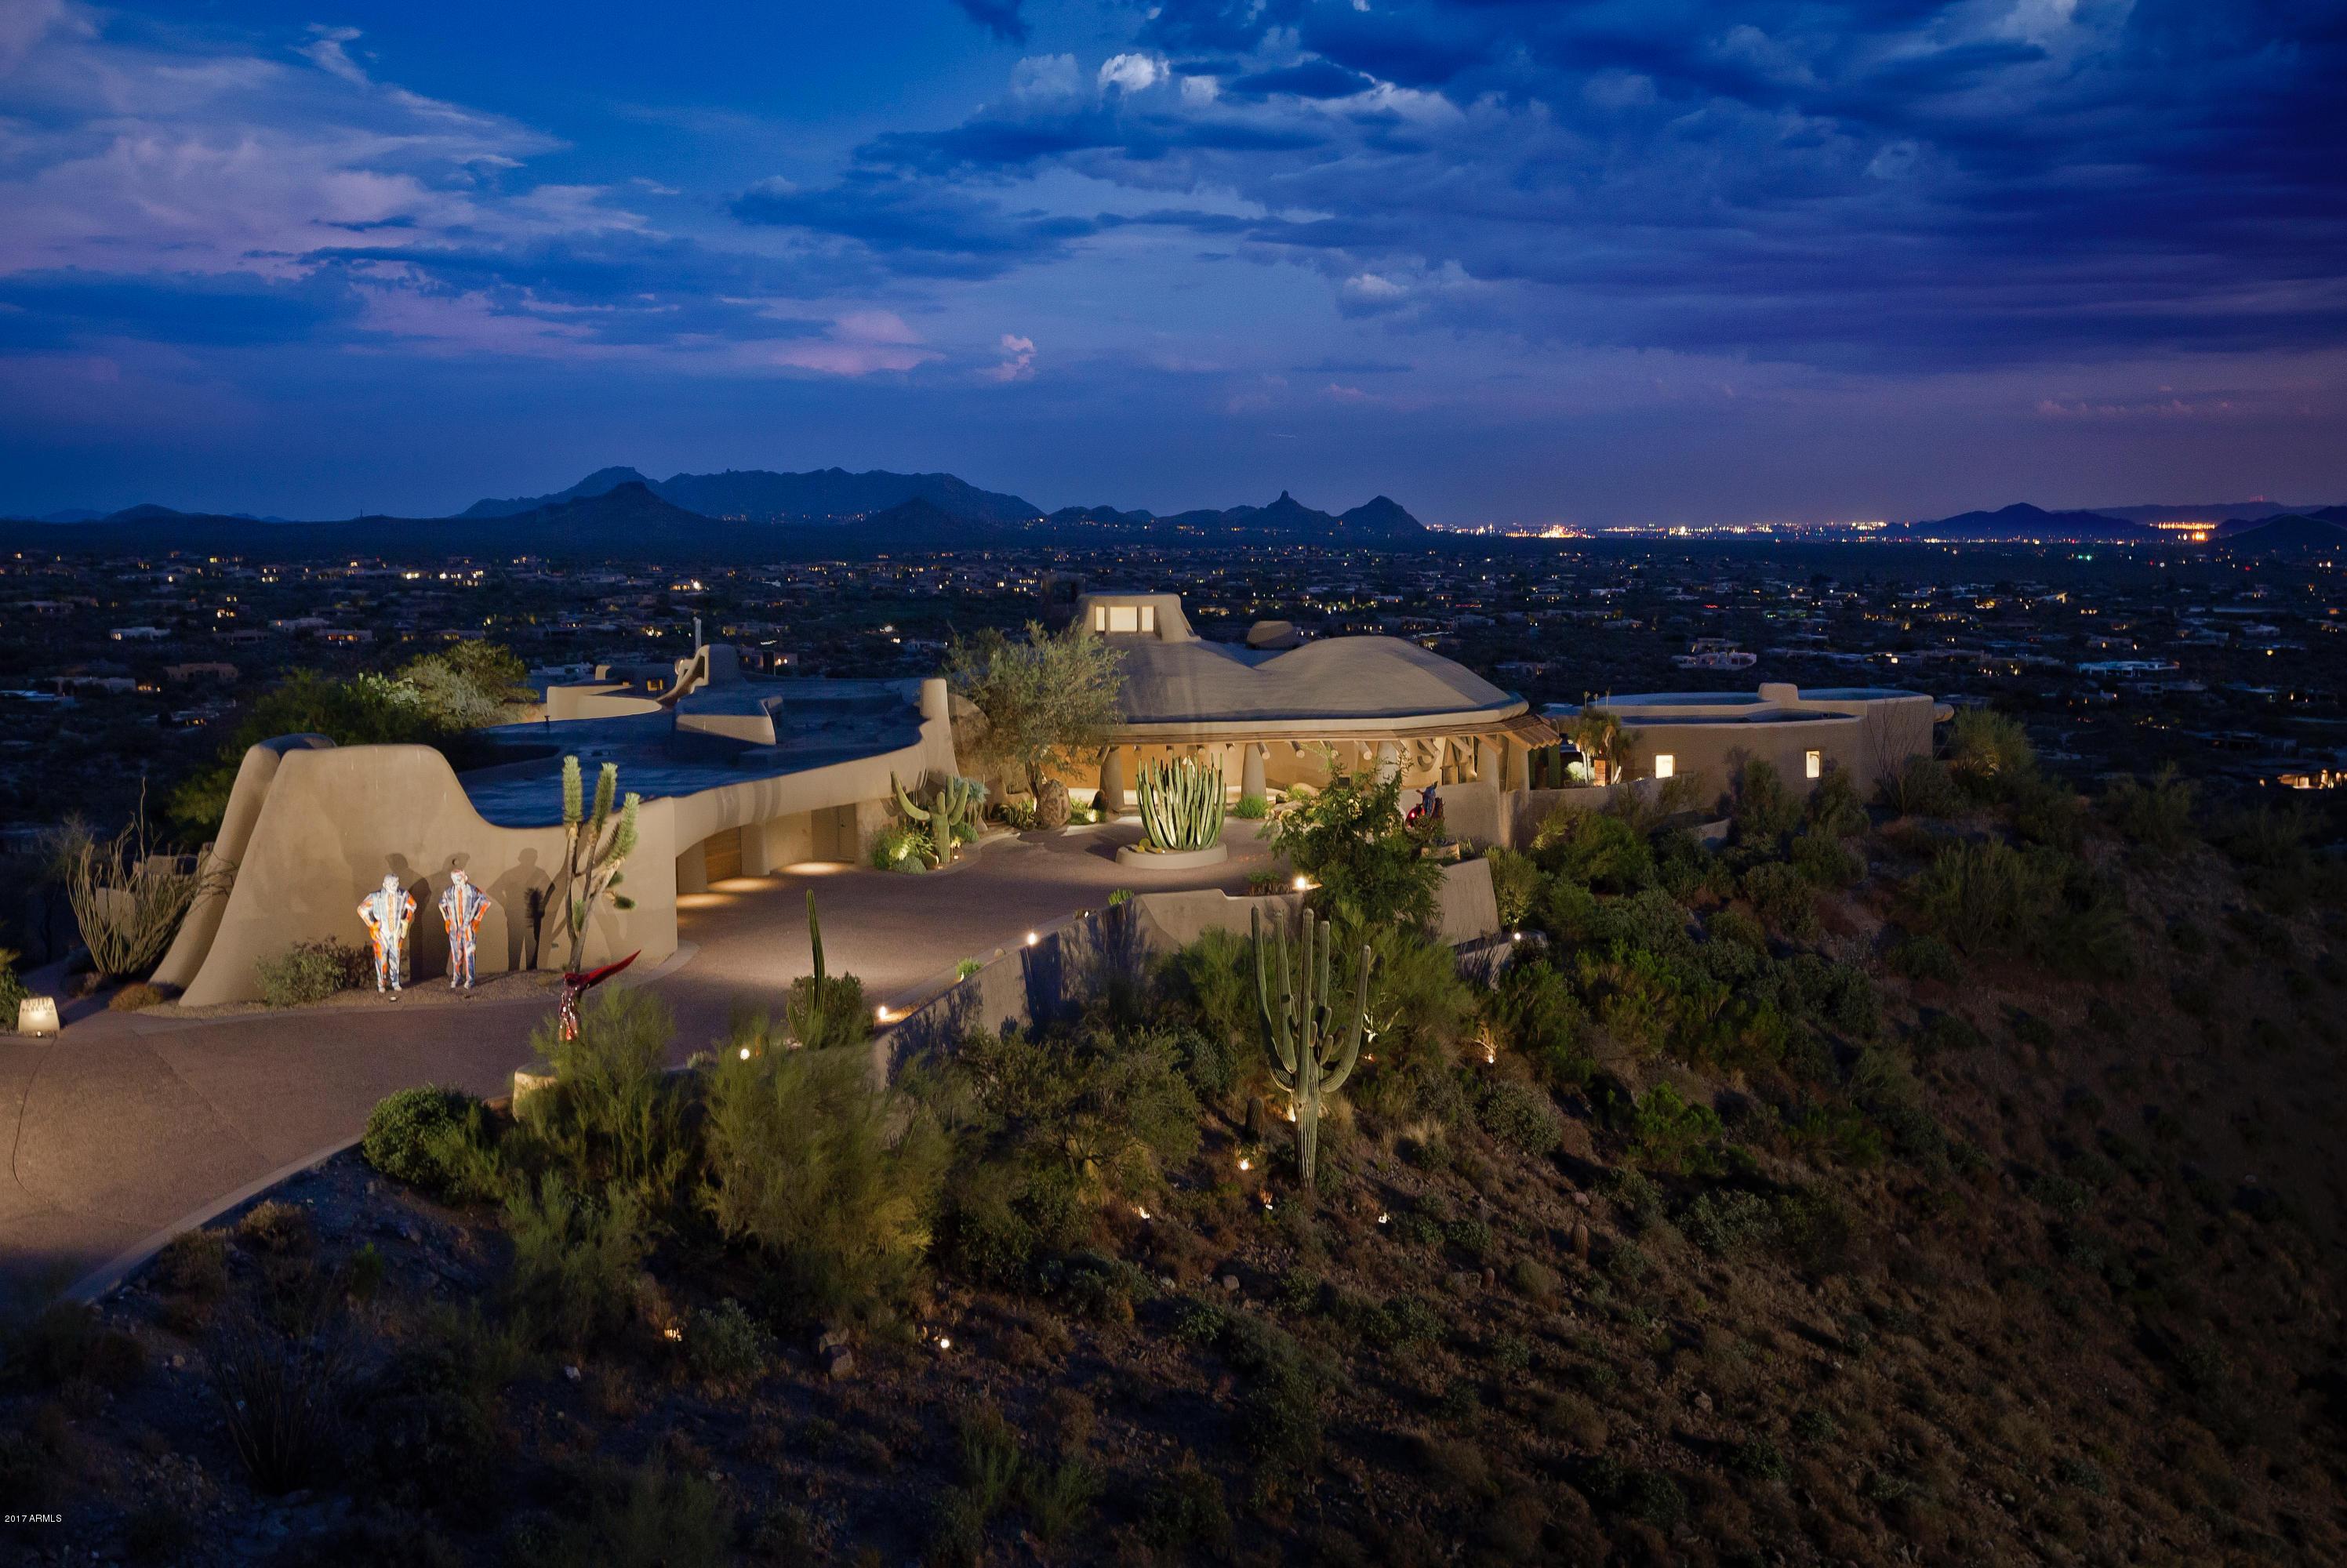 MLS 5560937 39029 N ALISTER MCKENZIE Drive, Scottsdale, AZ 85262 Scottsdale AZ Four Bedroom